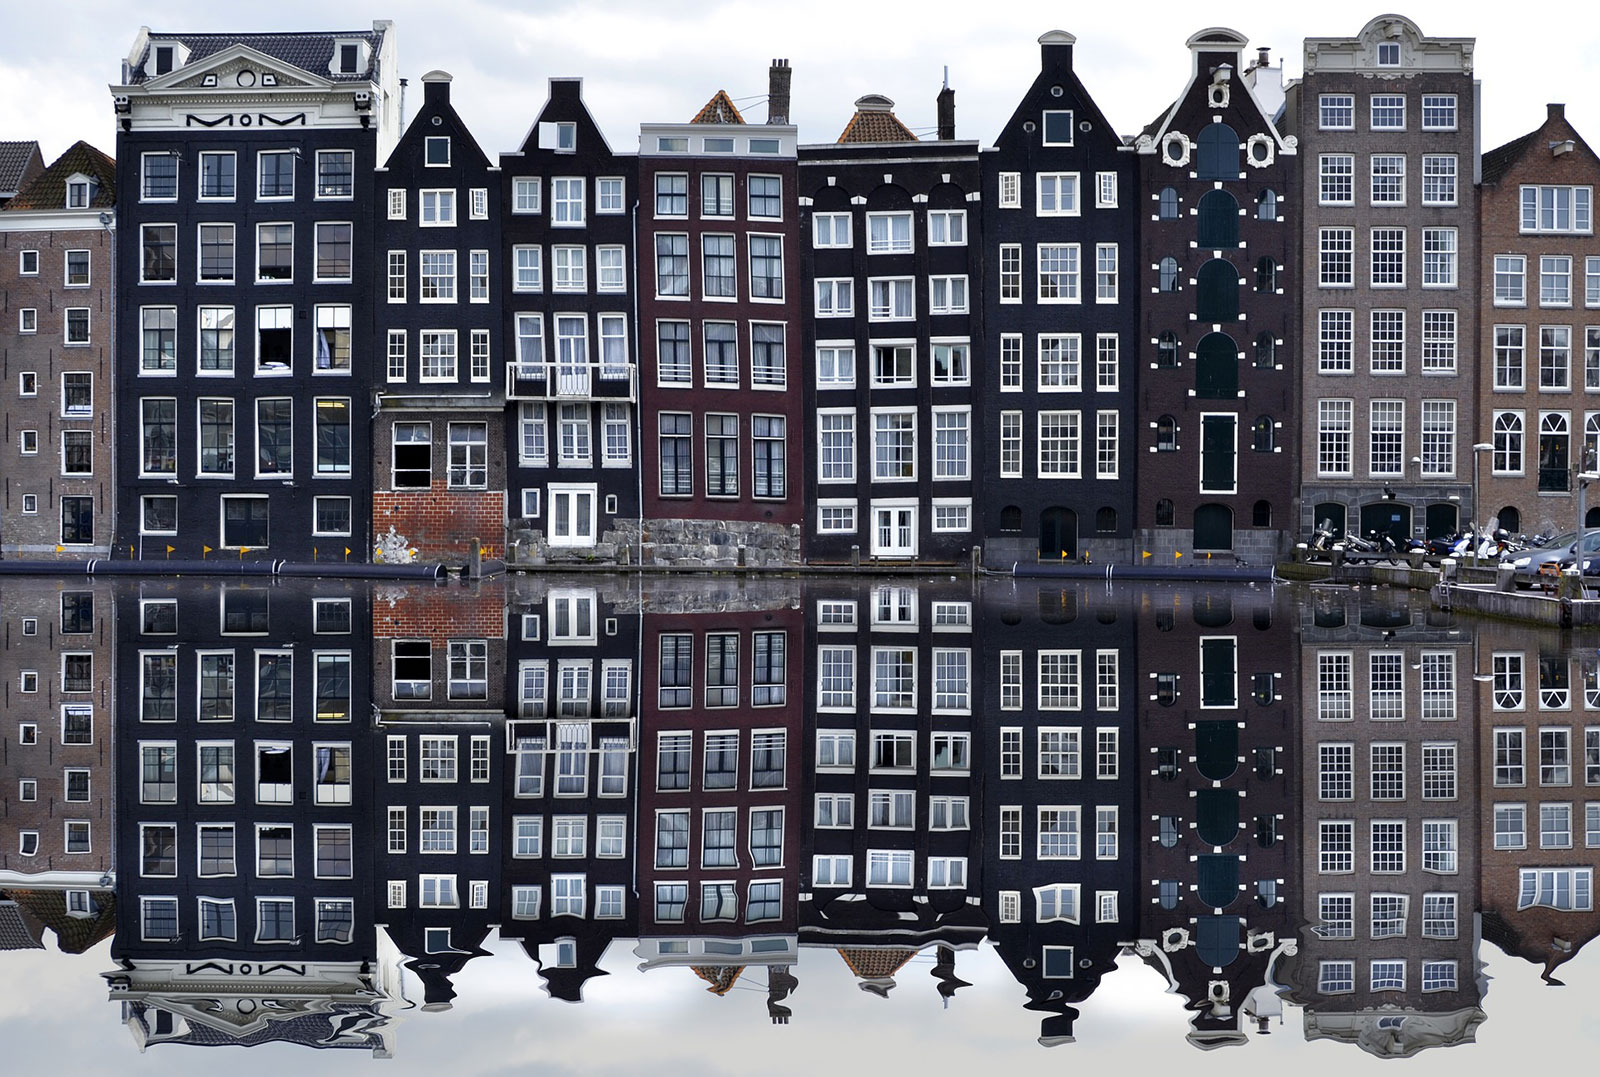 Amsterdam's slender canal houses